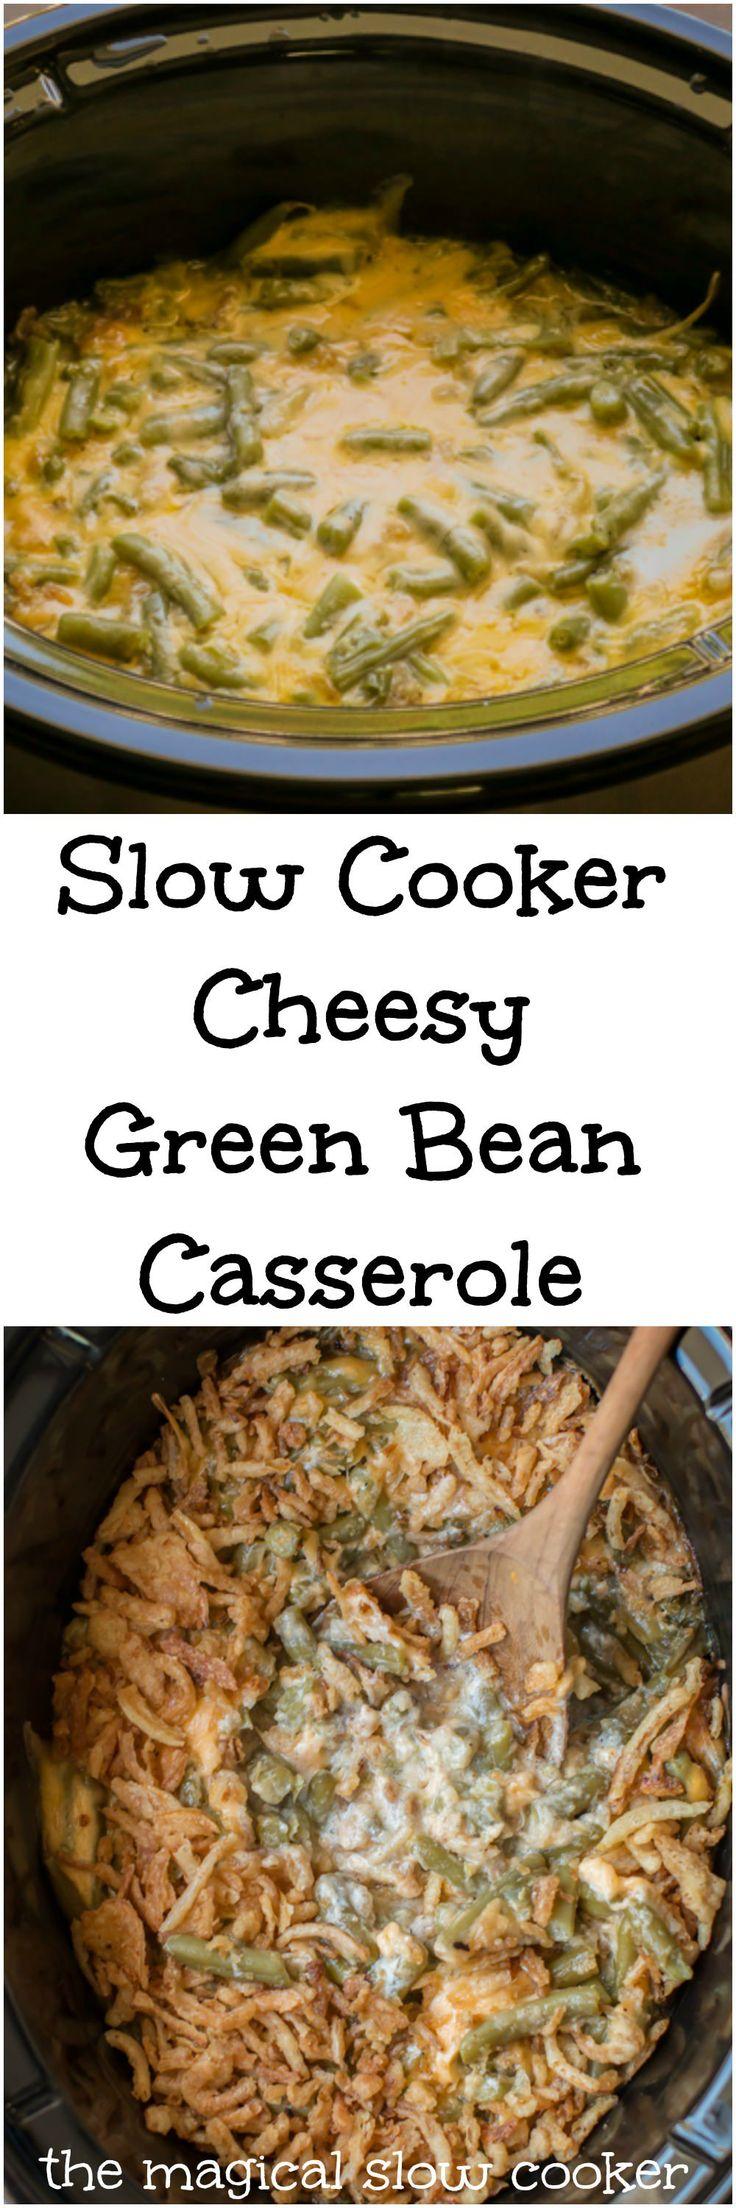 Slow Cooker Cheesy Green Bean Casserole